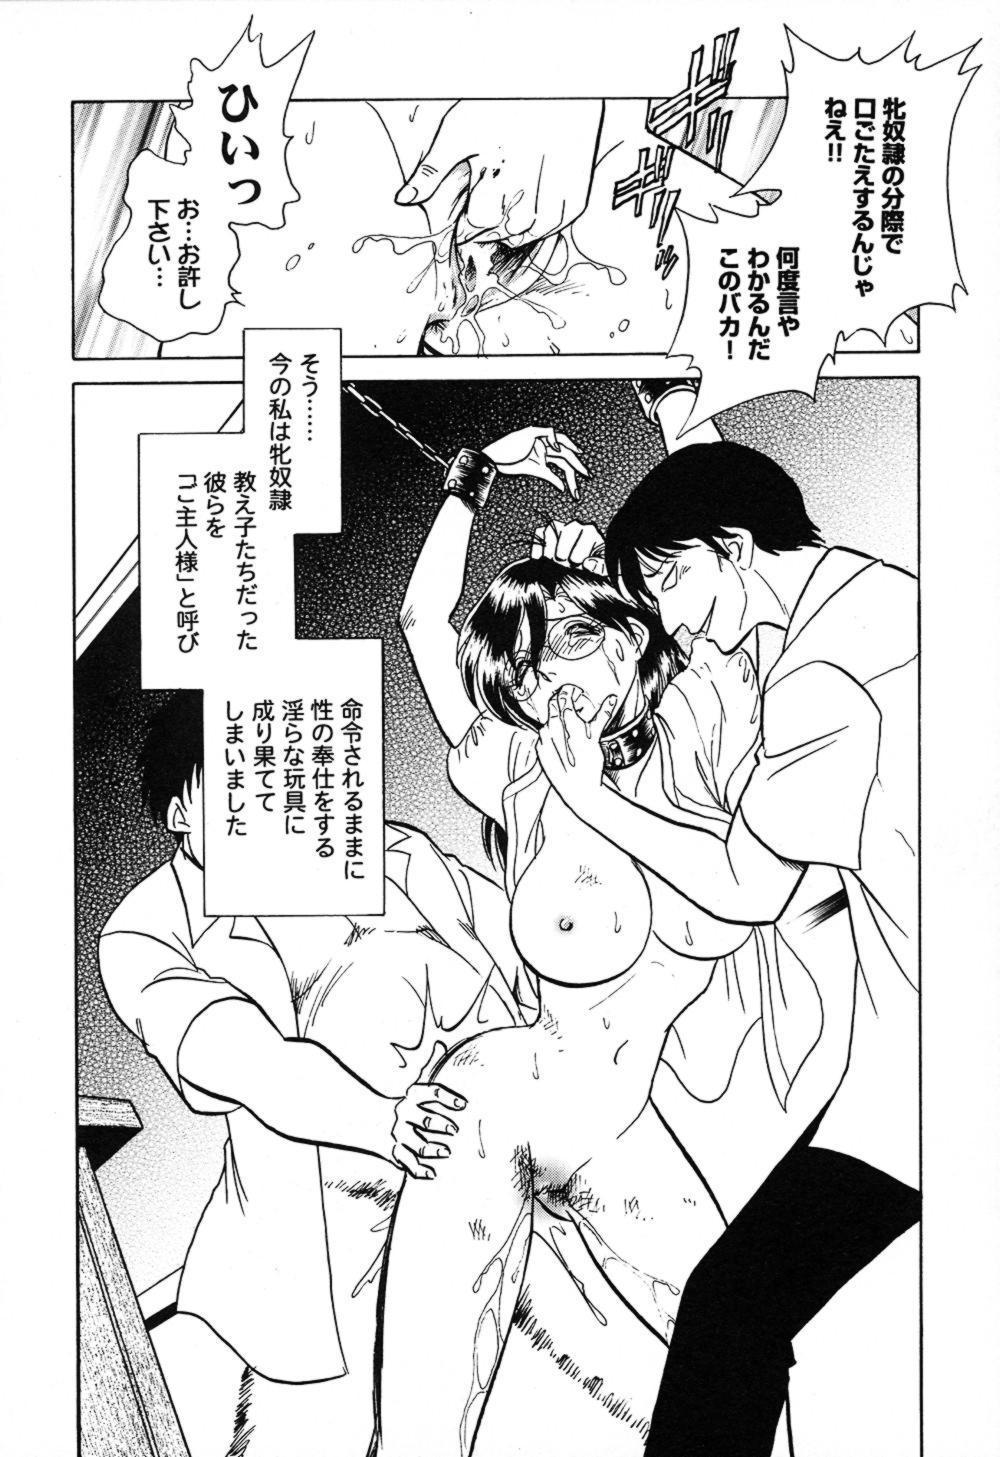 Hageshii Kagai Jugyou 8